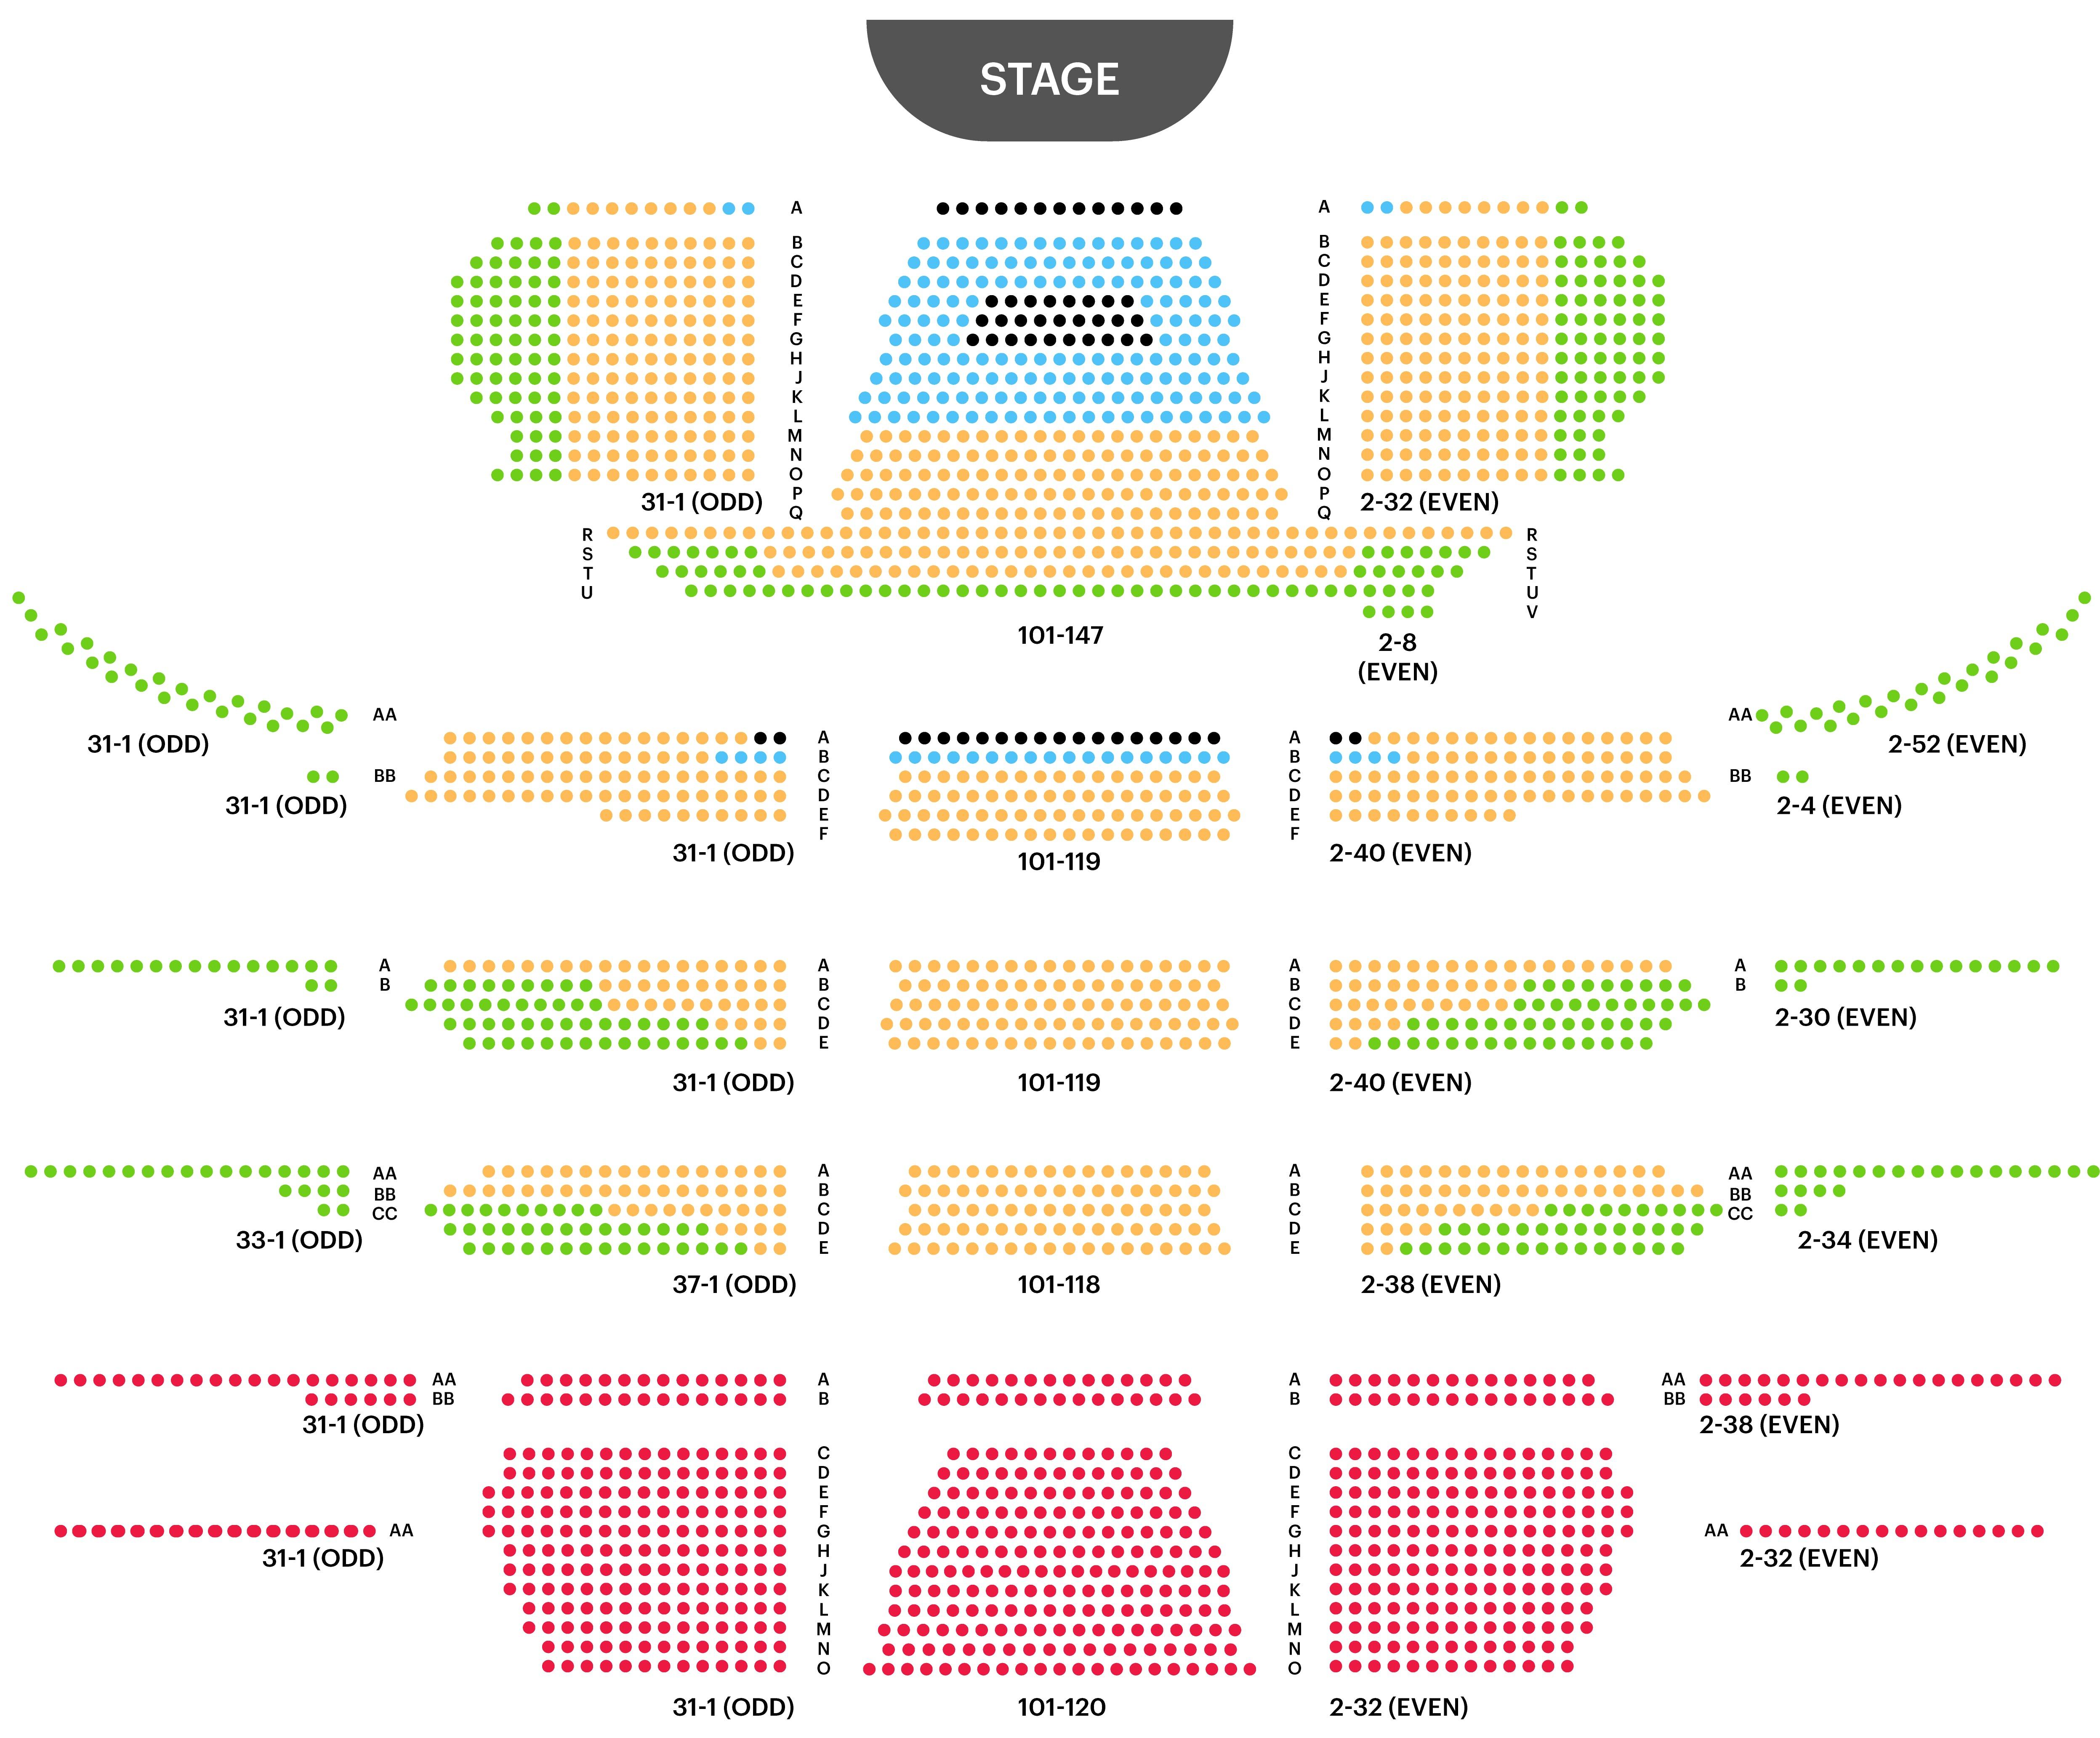 David H Koch Theatre Seating Chart